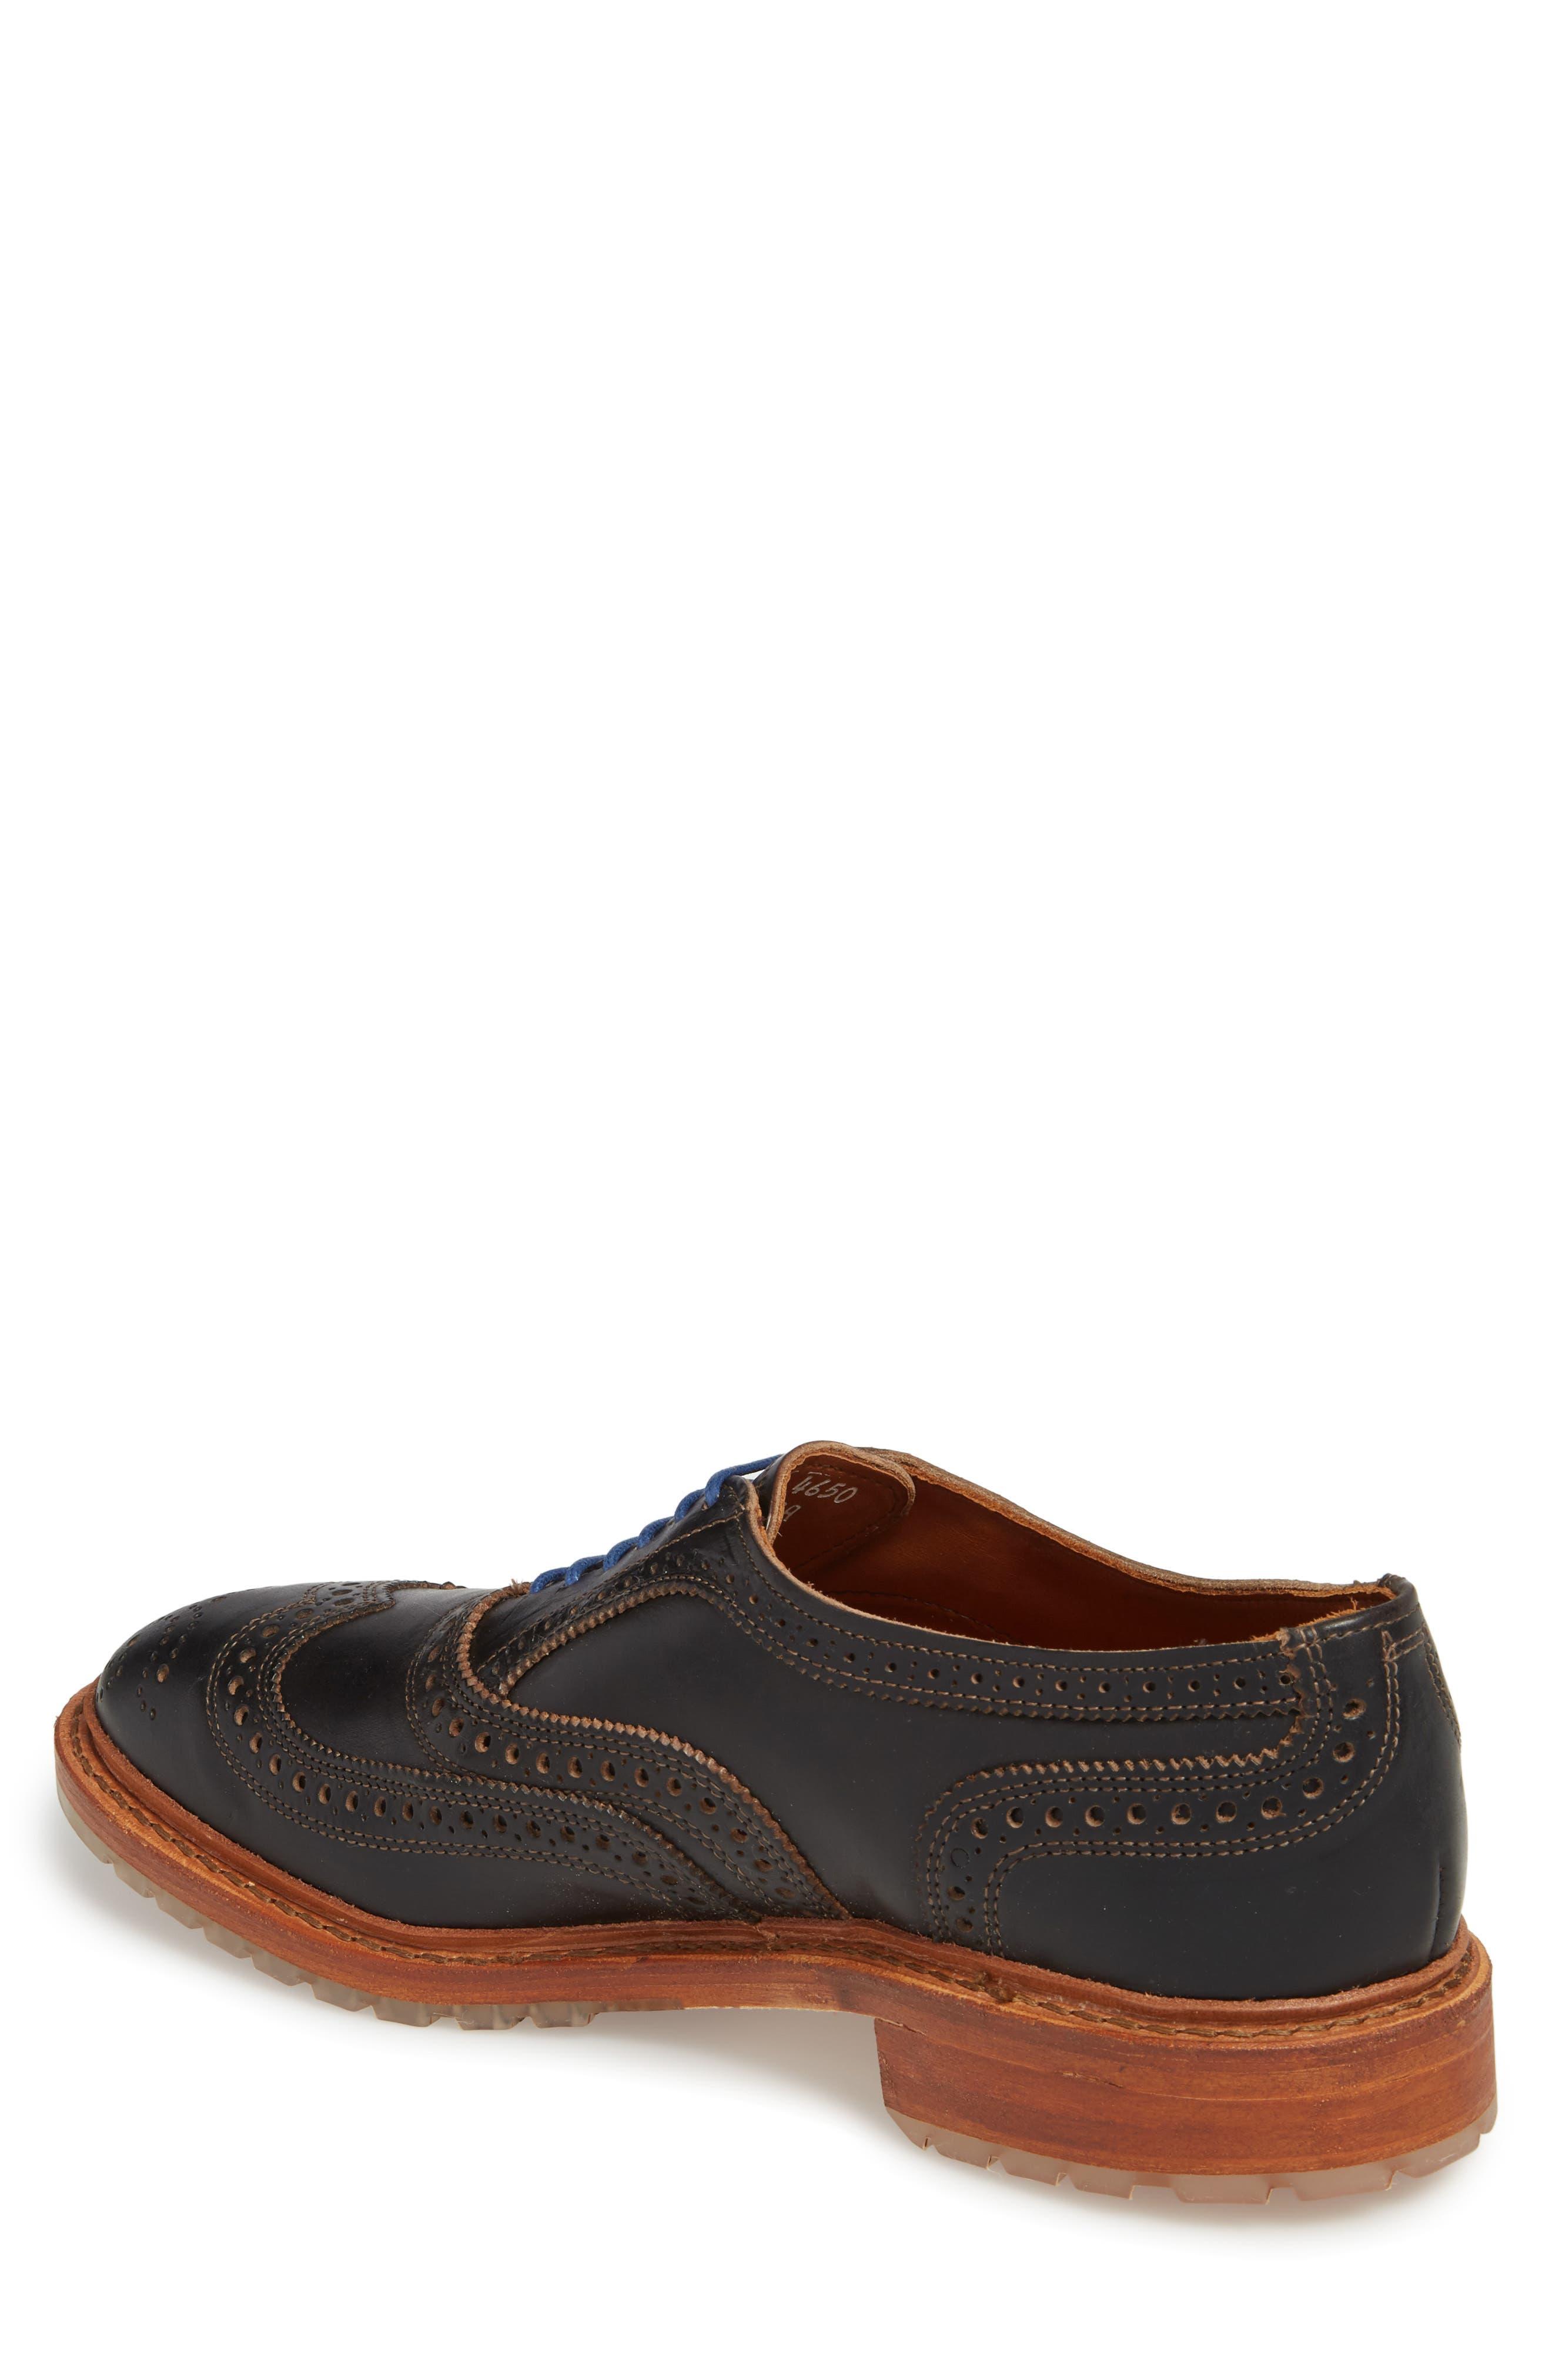 McTavish Lugged Wingtip,                             Alternate thumbnail 2, color,                             Black Leather